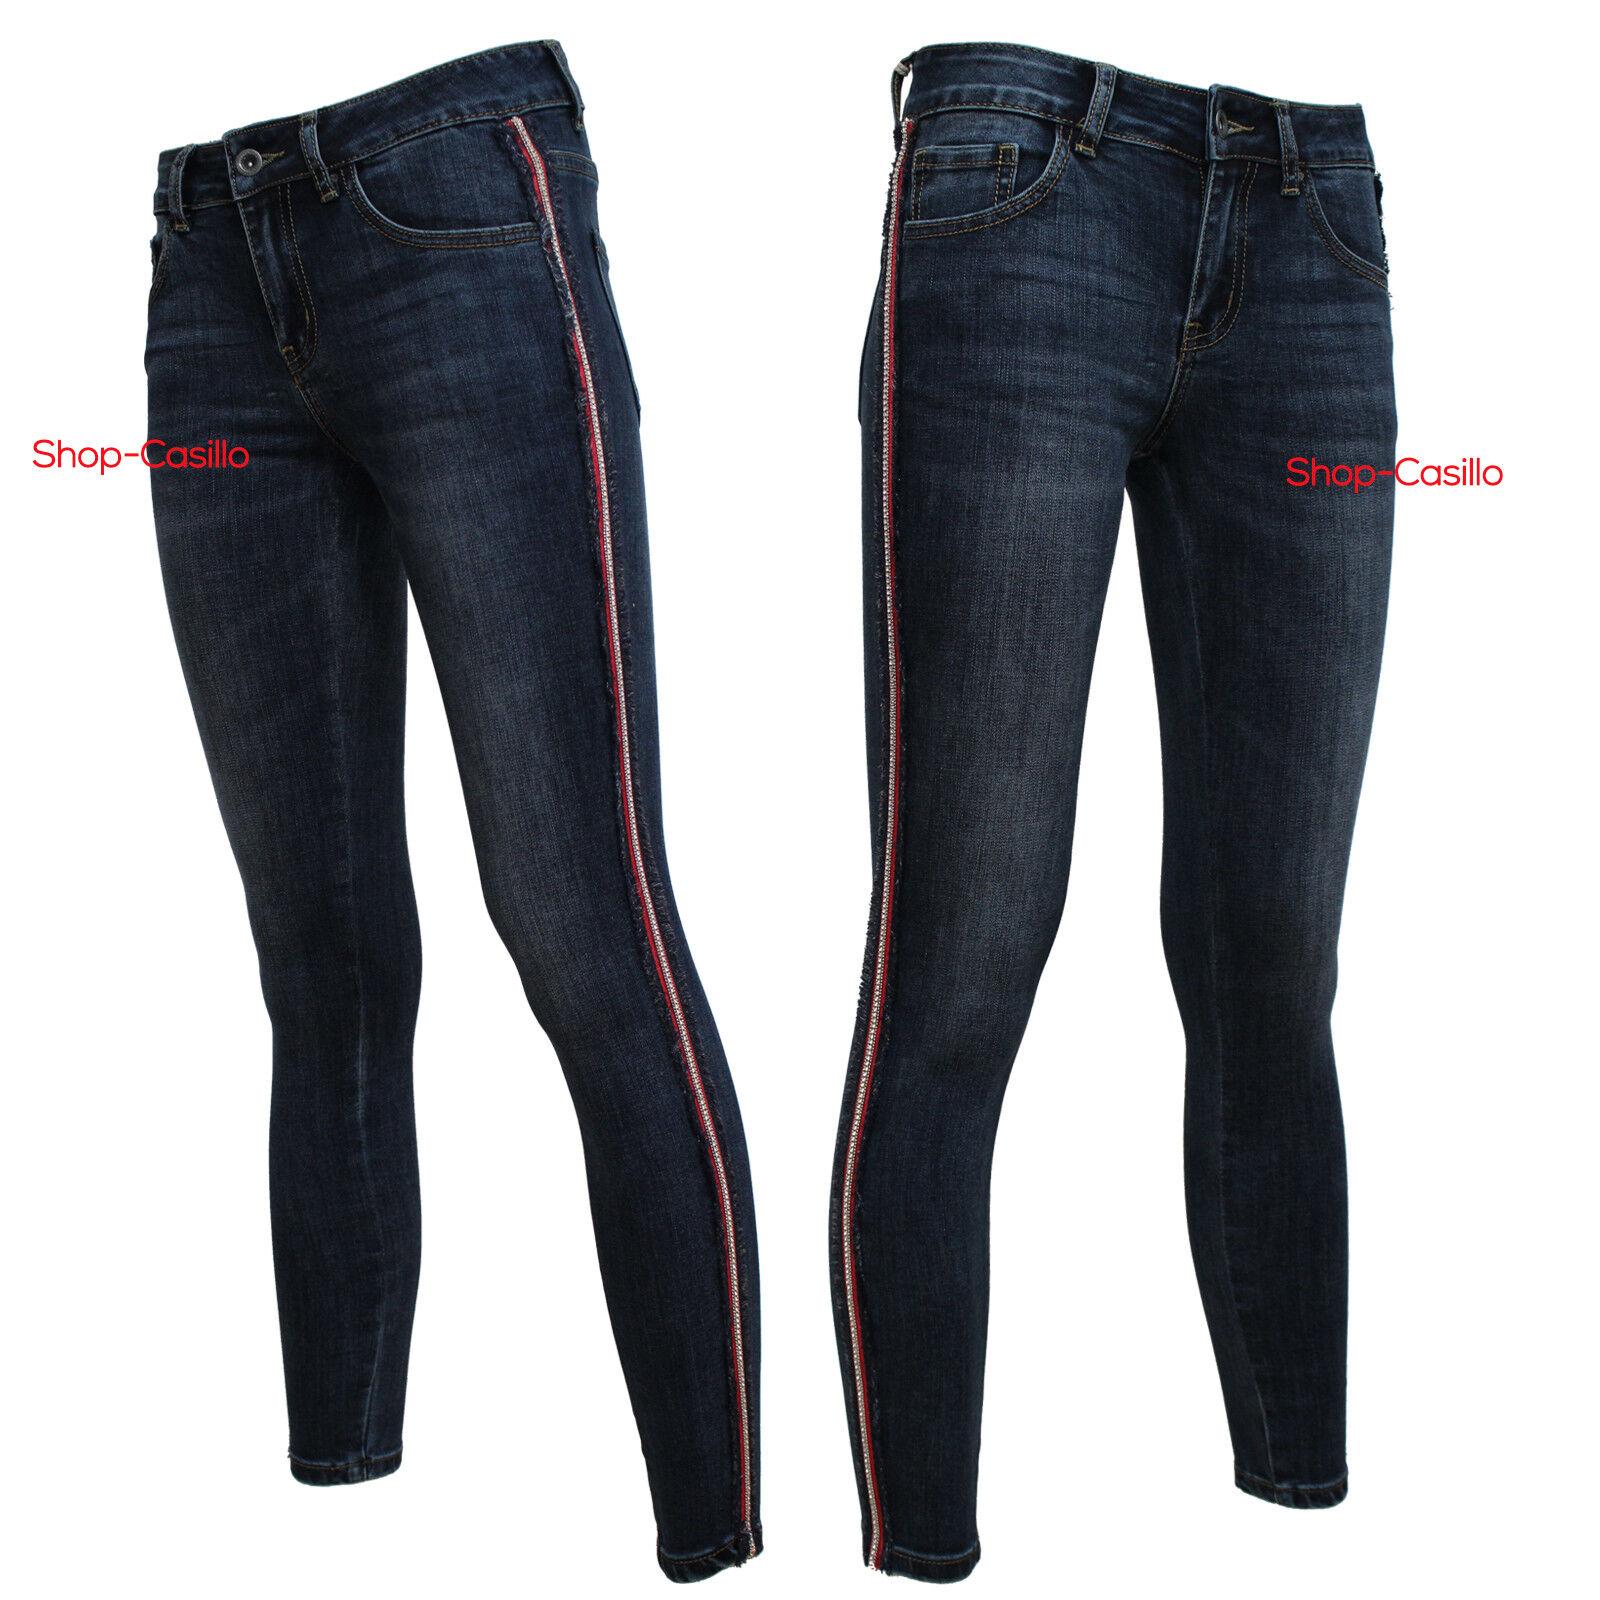 Jeans women Elastico Vita Bassa Pantaloni Stretti Skinny Aderenti Con Frange Top